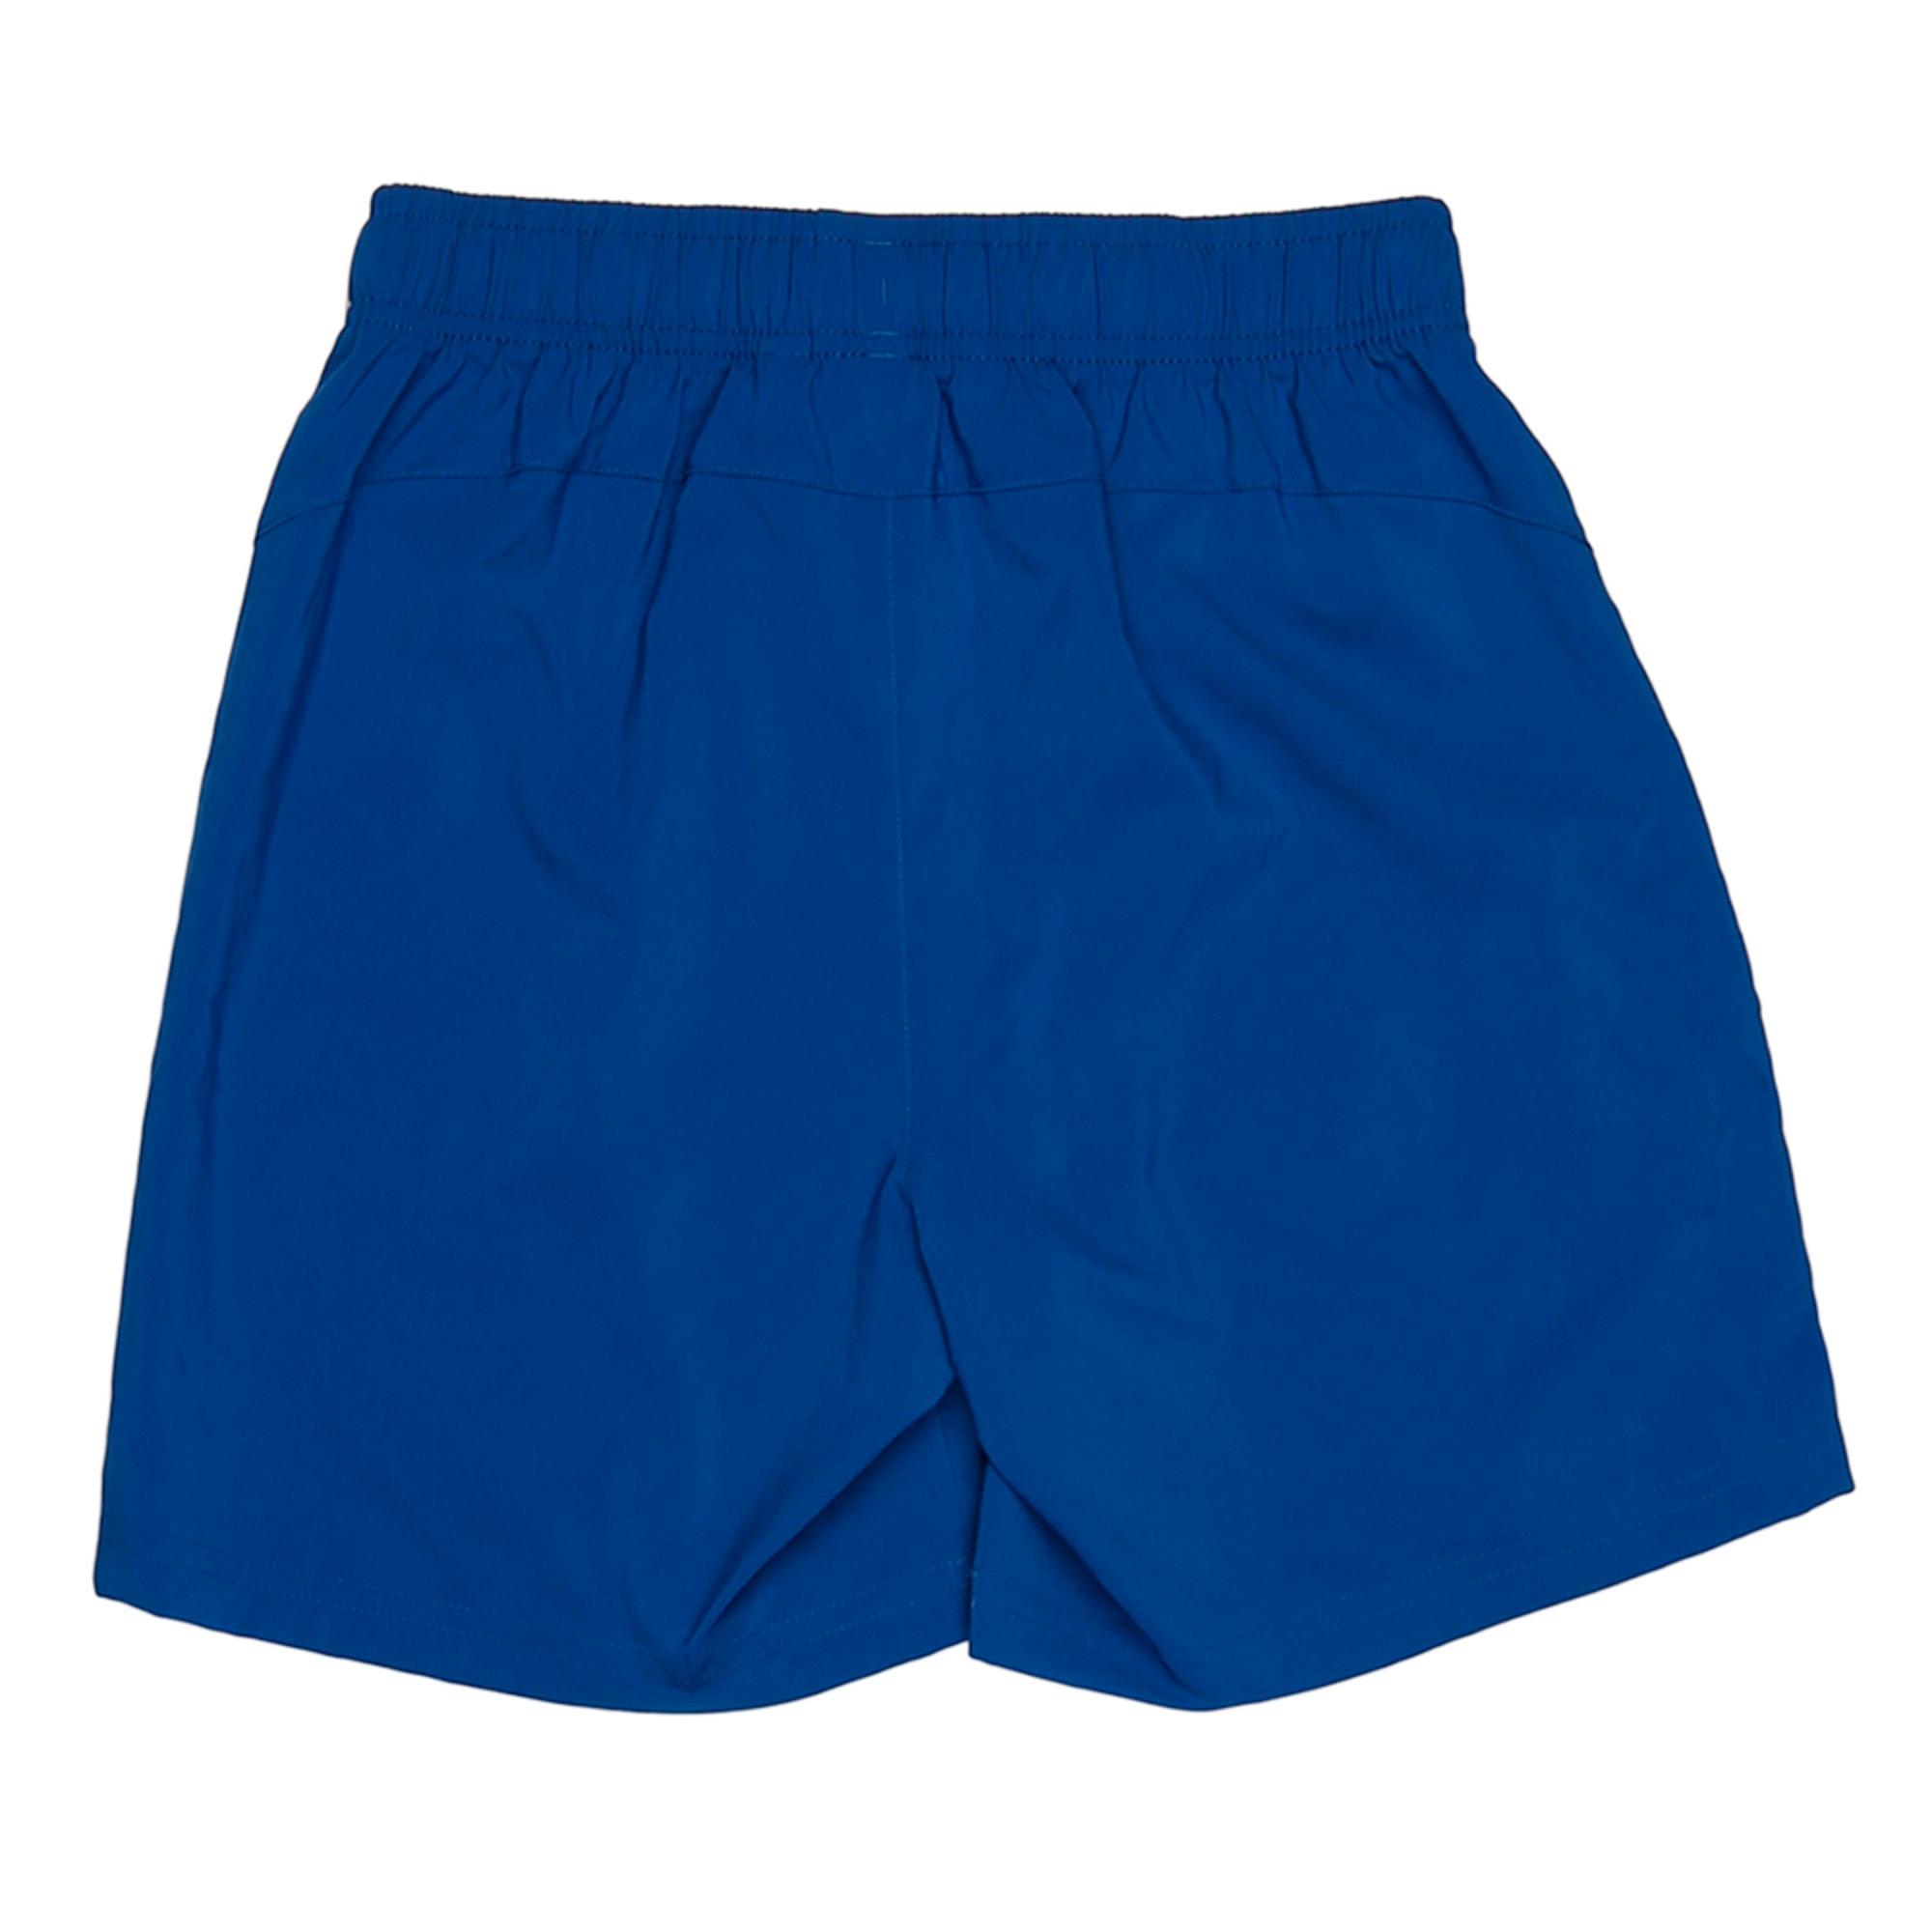 "Thumbnail 3 of ESS Woven Shorts 5"", TRUE BLUE, medium-IND"